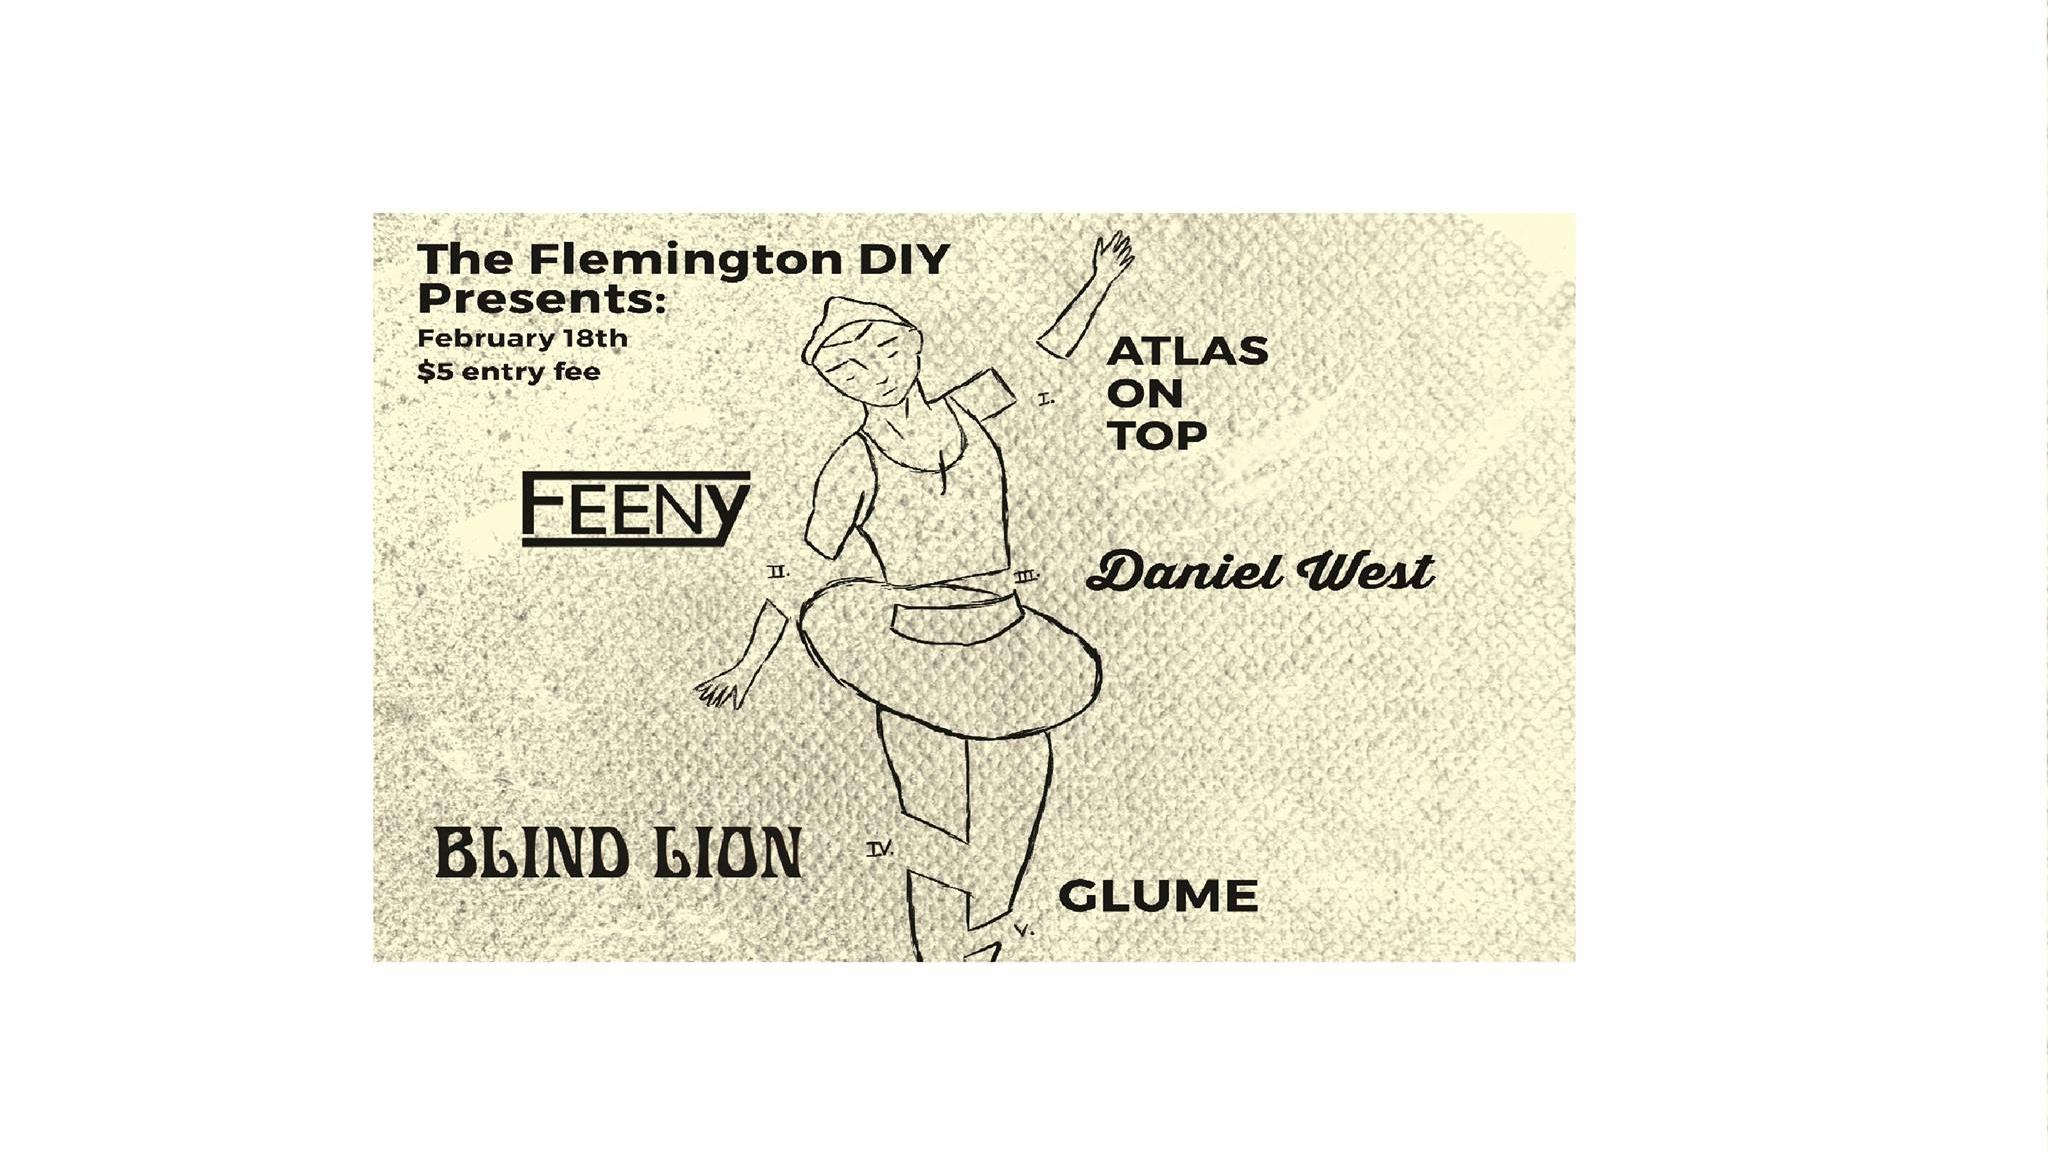 FLEMINGTON DIY PRESENTS: ACLU BENEFIT SHOW FEAT. FEENY, ATLAS ON TOP, GLUME, BLIND LION, DANIEL WEST (Feb. 18, 2017)   Punk, Emo, Pop Punk, Punk Rock, Alternative   Flemington, NJ   Posted Monday, February 13, 2017